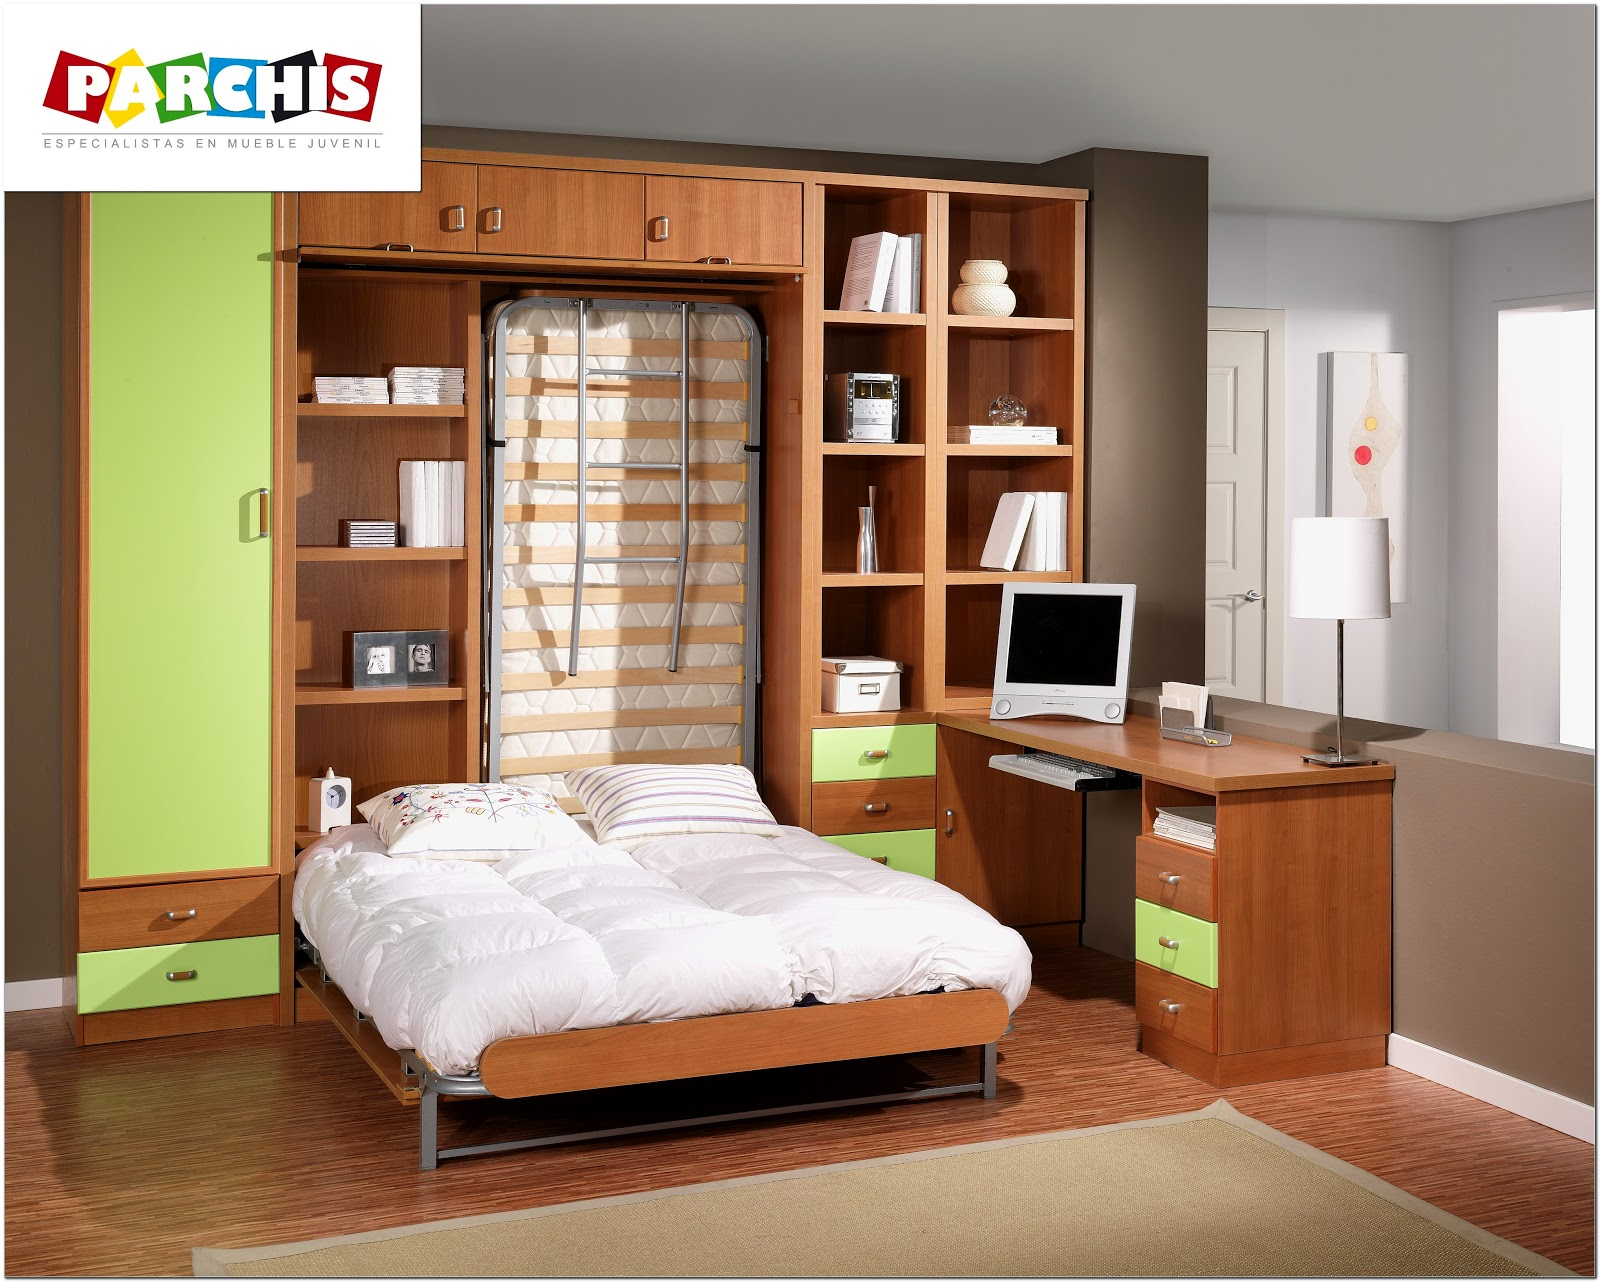 Camas abatibles dormitorios juveniles por parchis mueble for Muebles infantiles juveniles